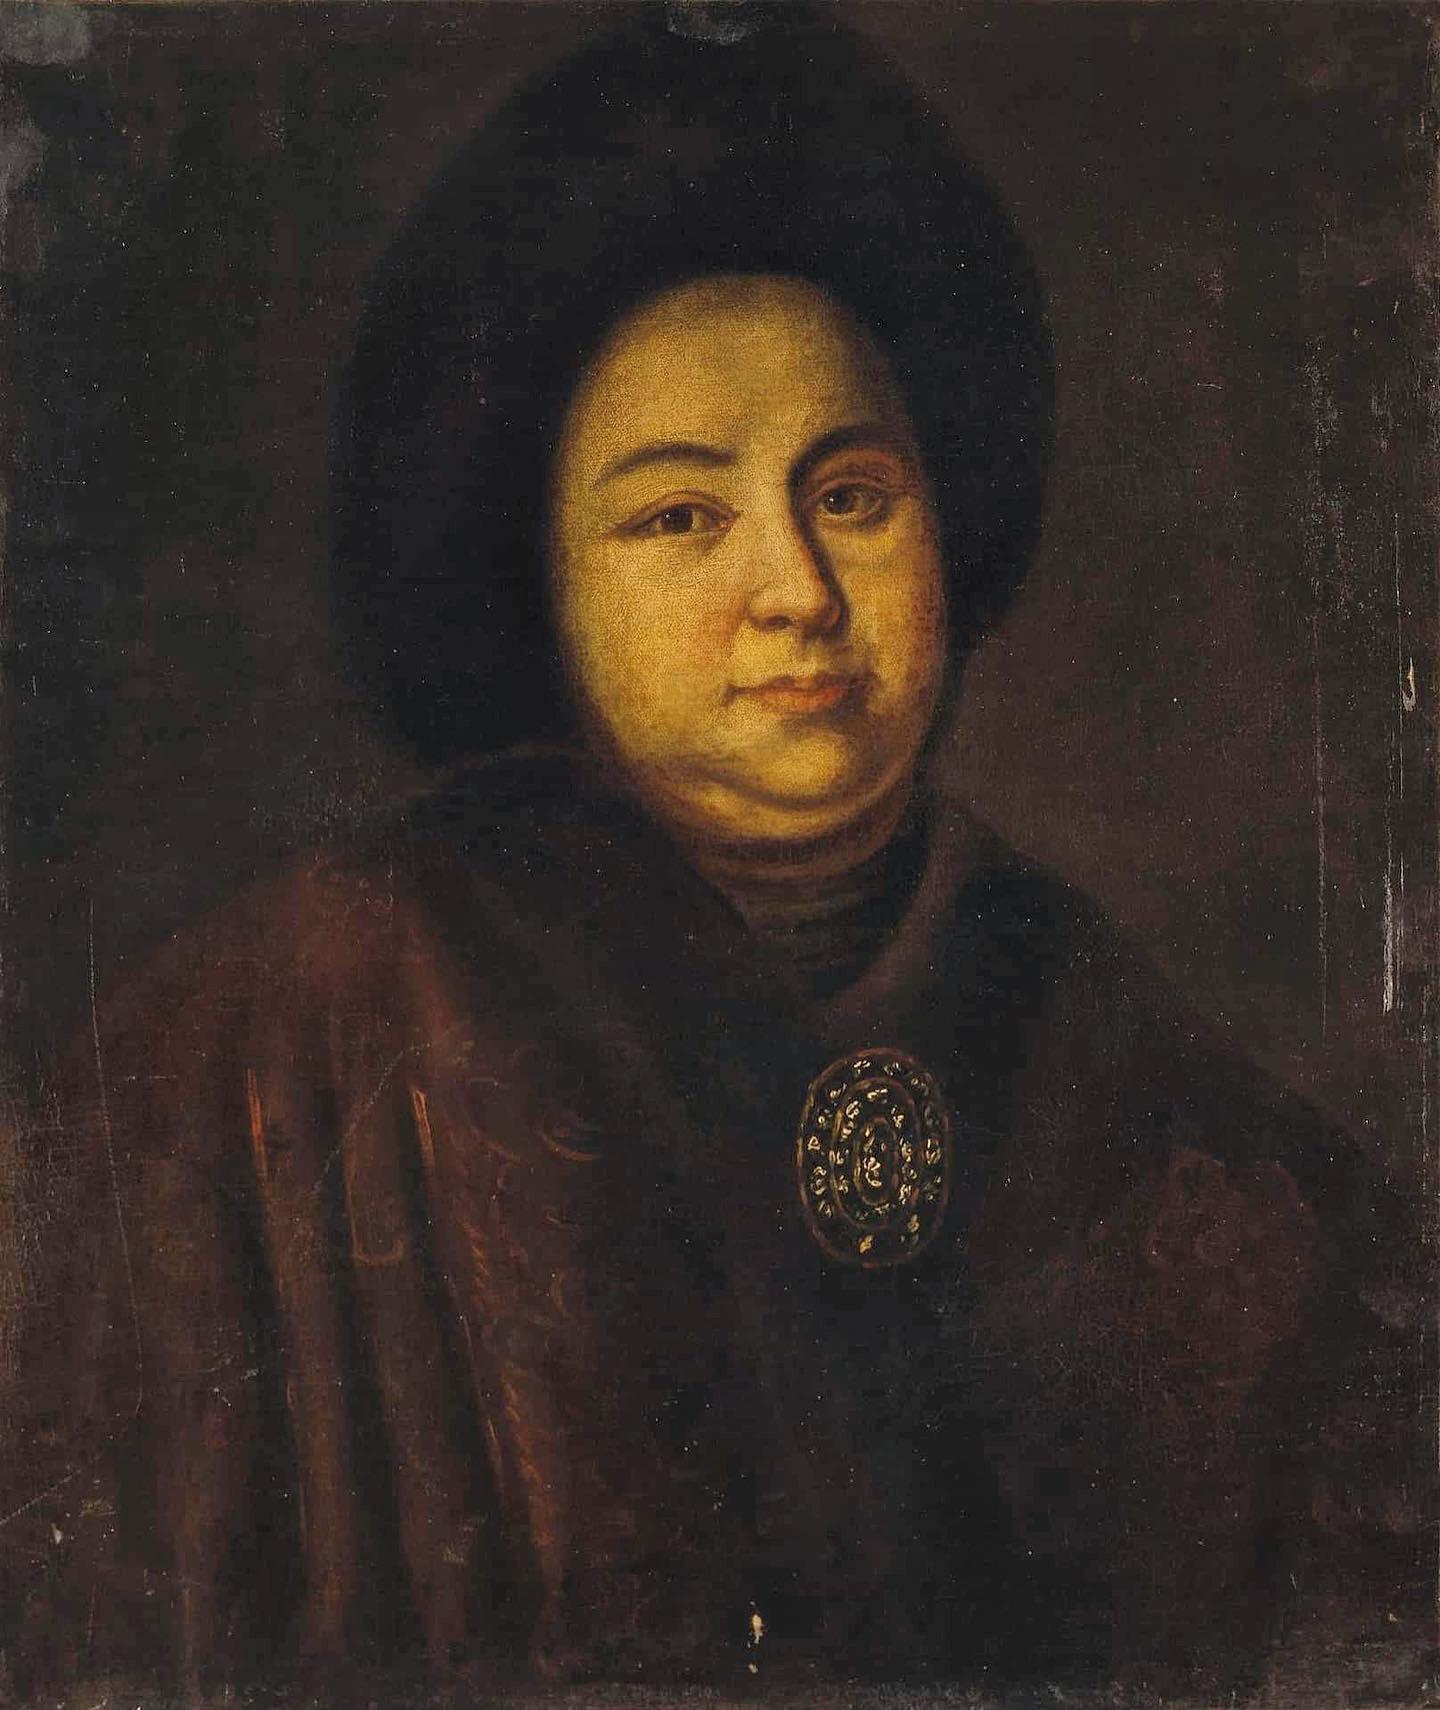 Pelukis anonim. Potret Tsarina Yevdokiya Lopukhina abad ke-18 (1669—1731)